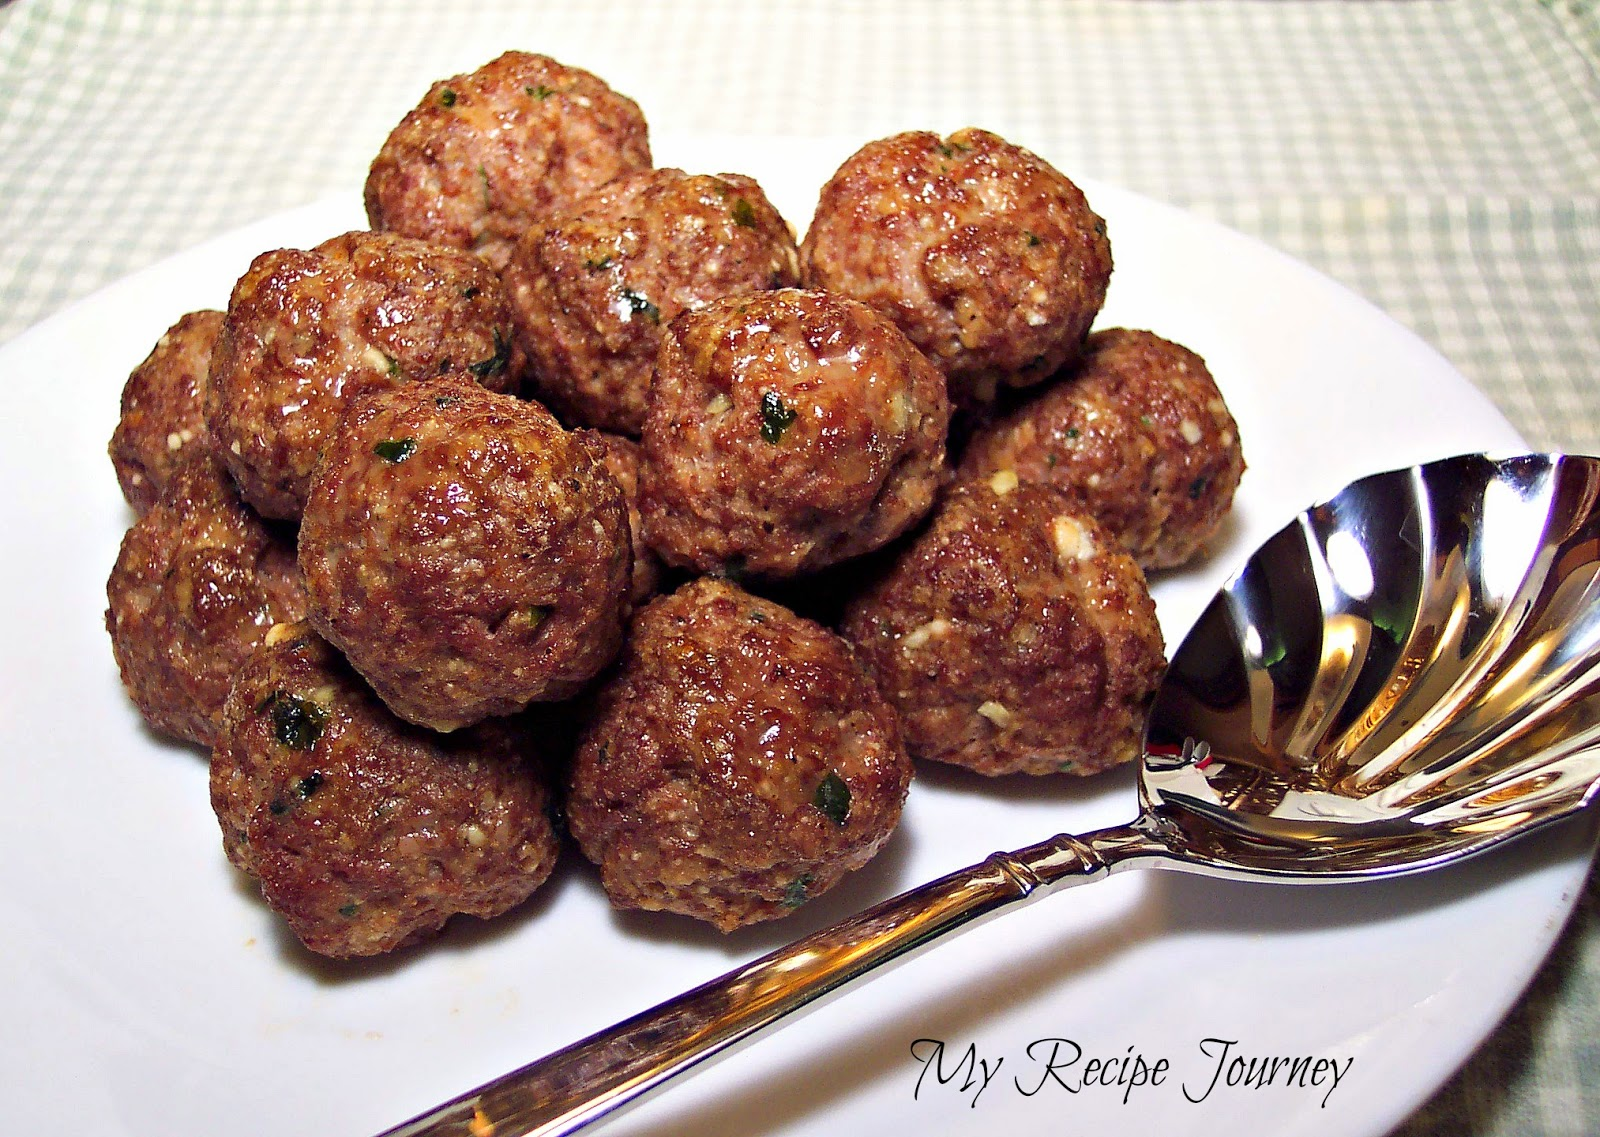 Old Fashioned Classic Italian Meatballs - Family Recipe